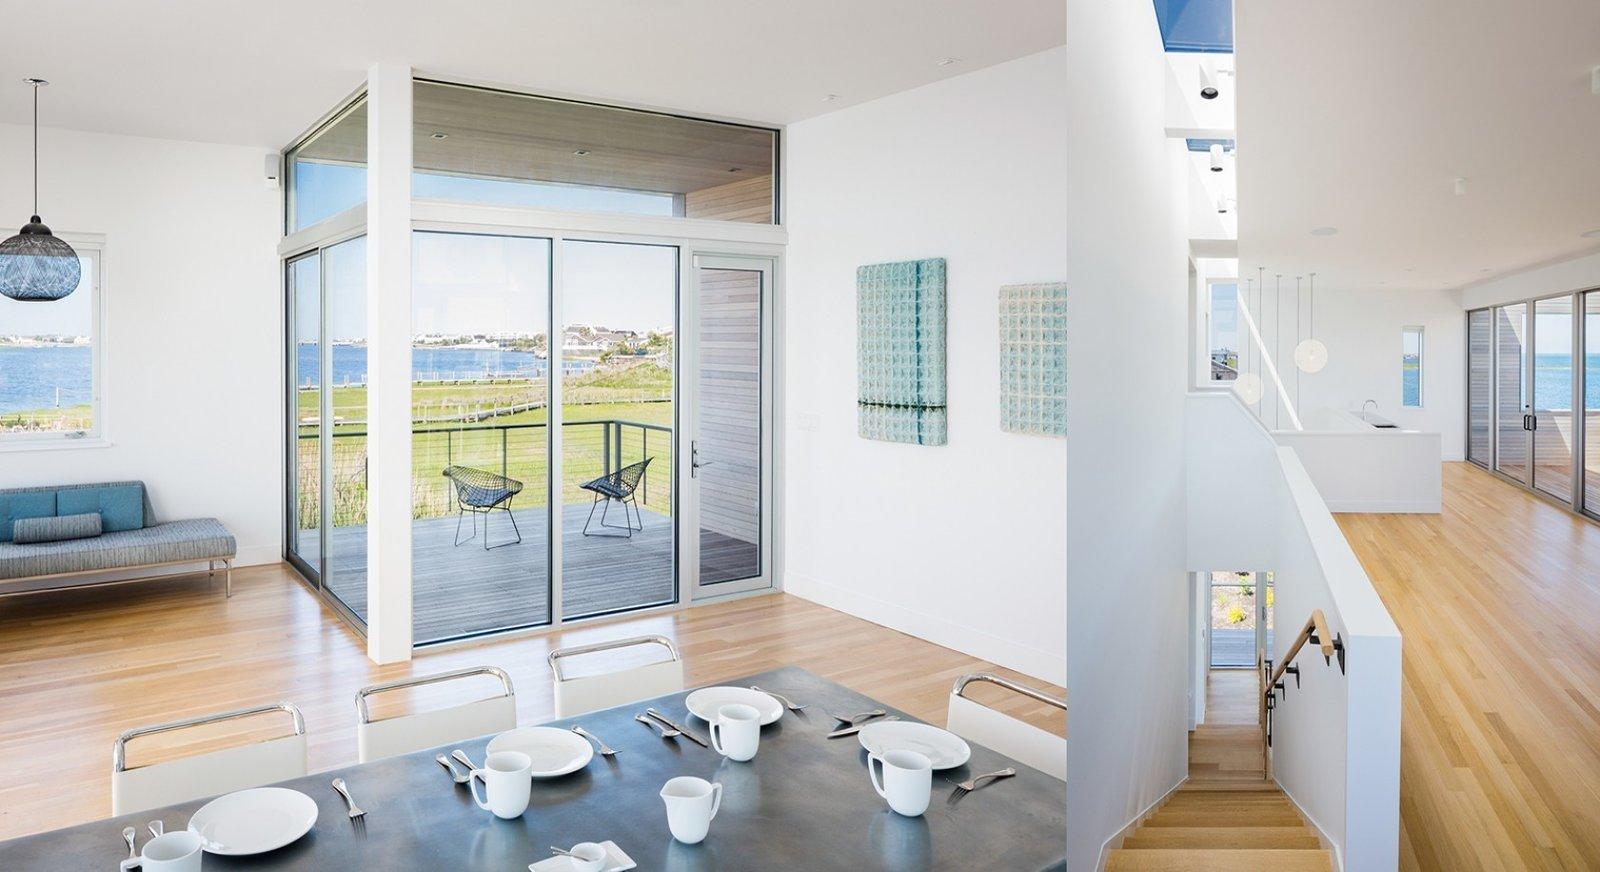 #CubeHouse #interior #inside #staircase #deck #chairs #seating #table #windows #naturallighting #dining #lighting #Westhamptonbeach #NewYork #LeroyStreetStudio   Cube House by Leroy Street Studio